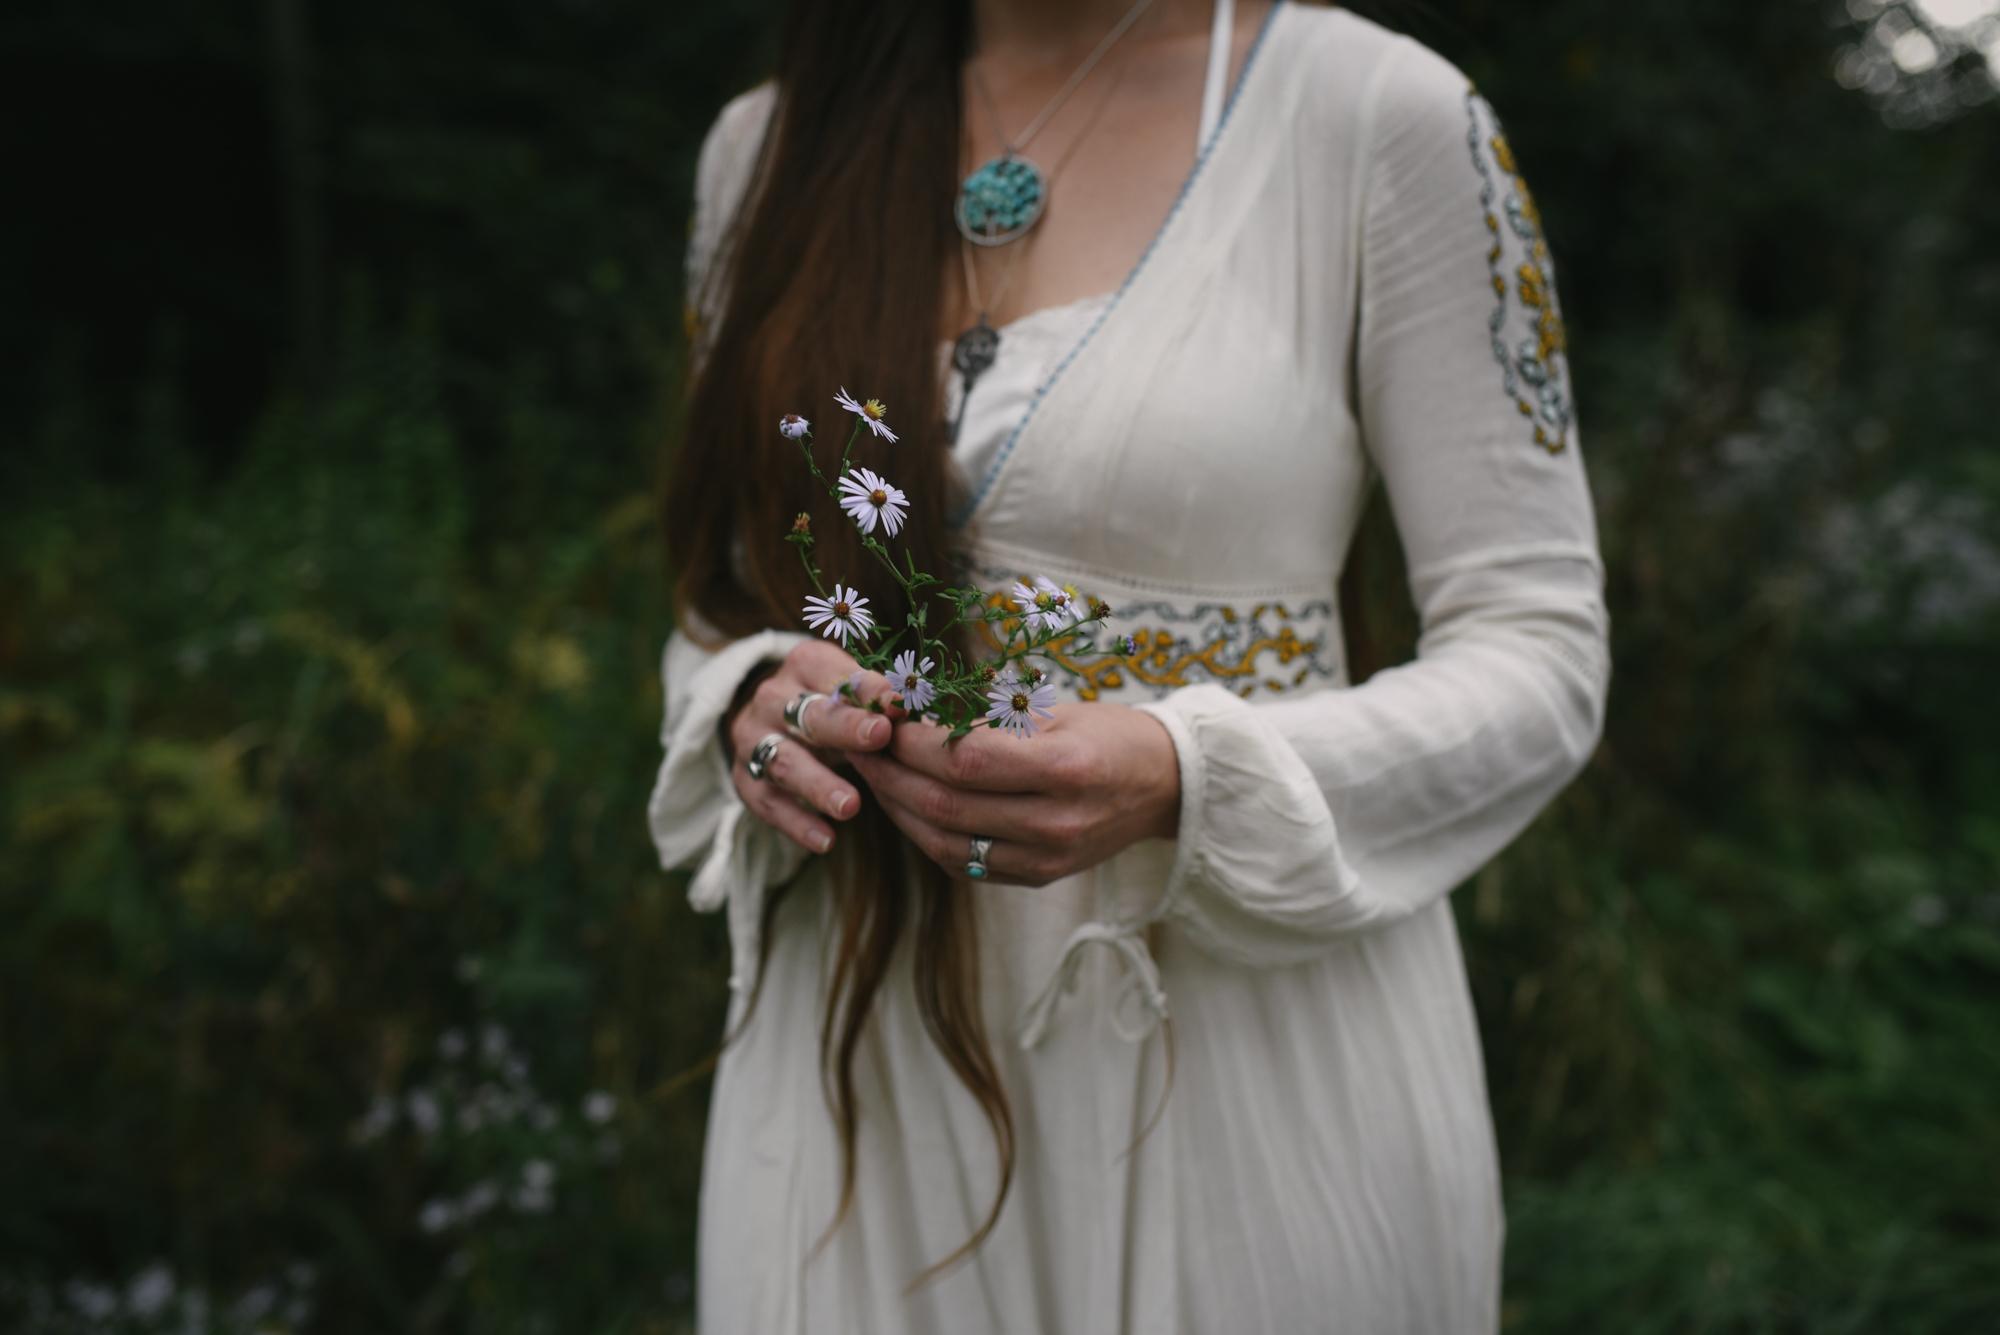 Mountain Wedding, Outdoors, Rustic, West Virginia, Maryland Wedding Photographer, DIY, Casual, Bride holding wildflowers, emroidered wedding dress, boho wedding